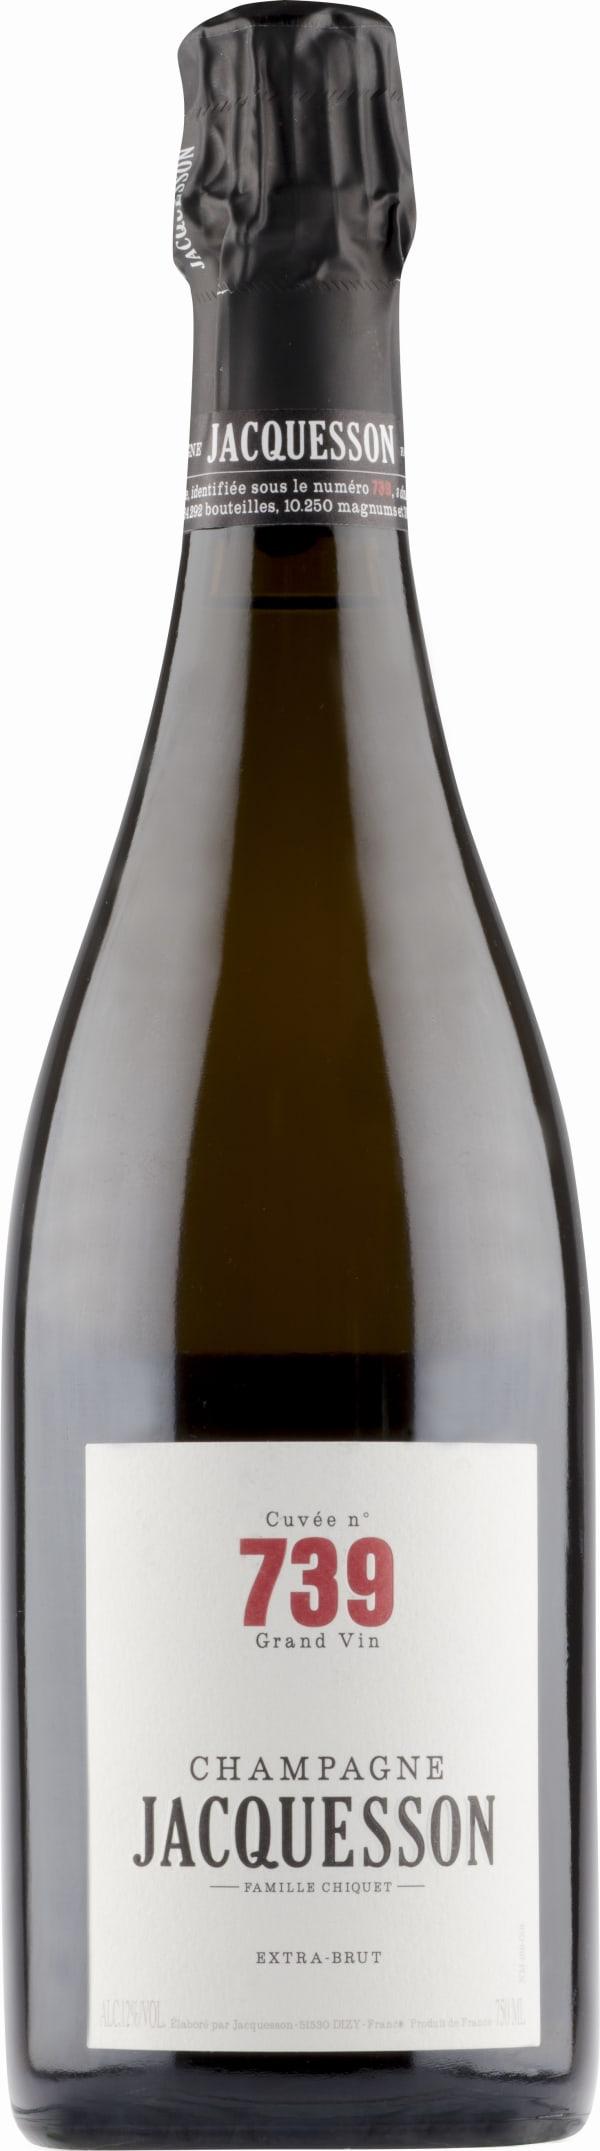 Jacquesson Cuvée 739 Champagne Extra-Brut